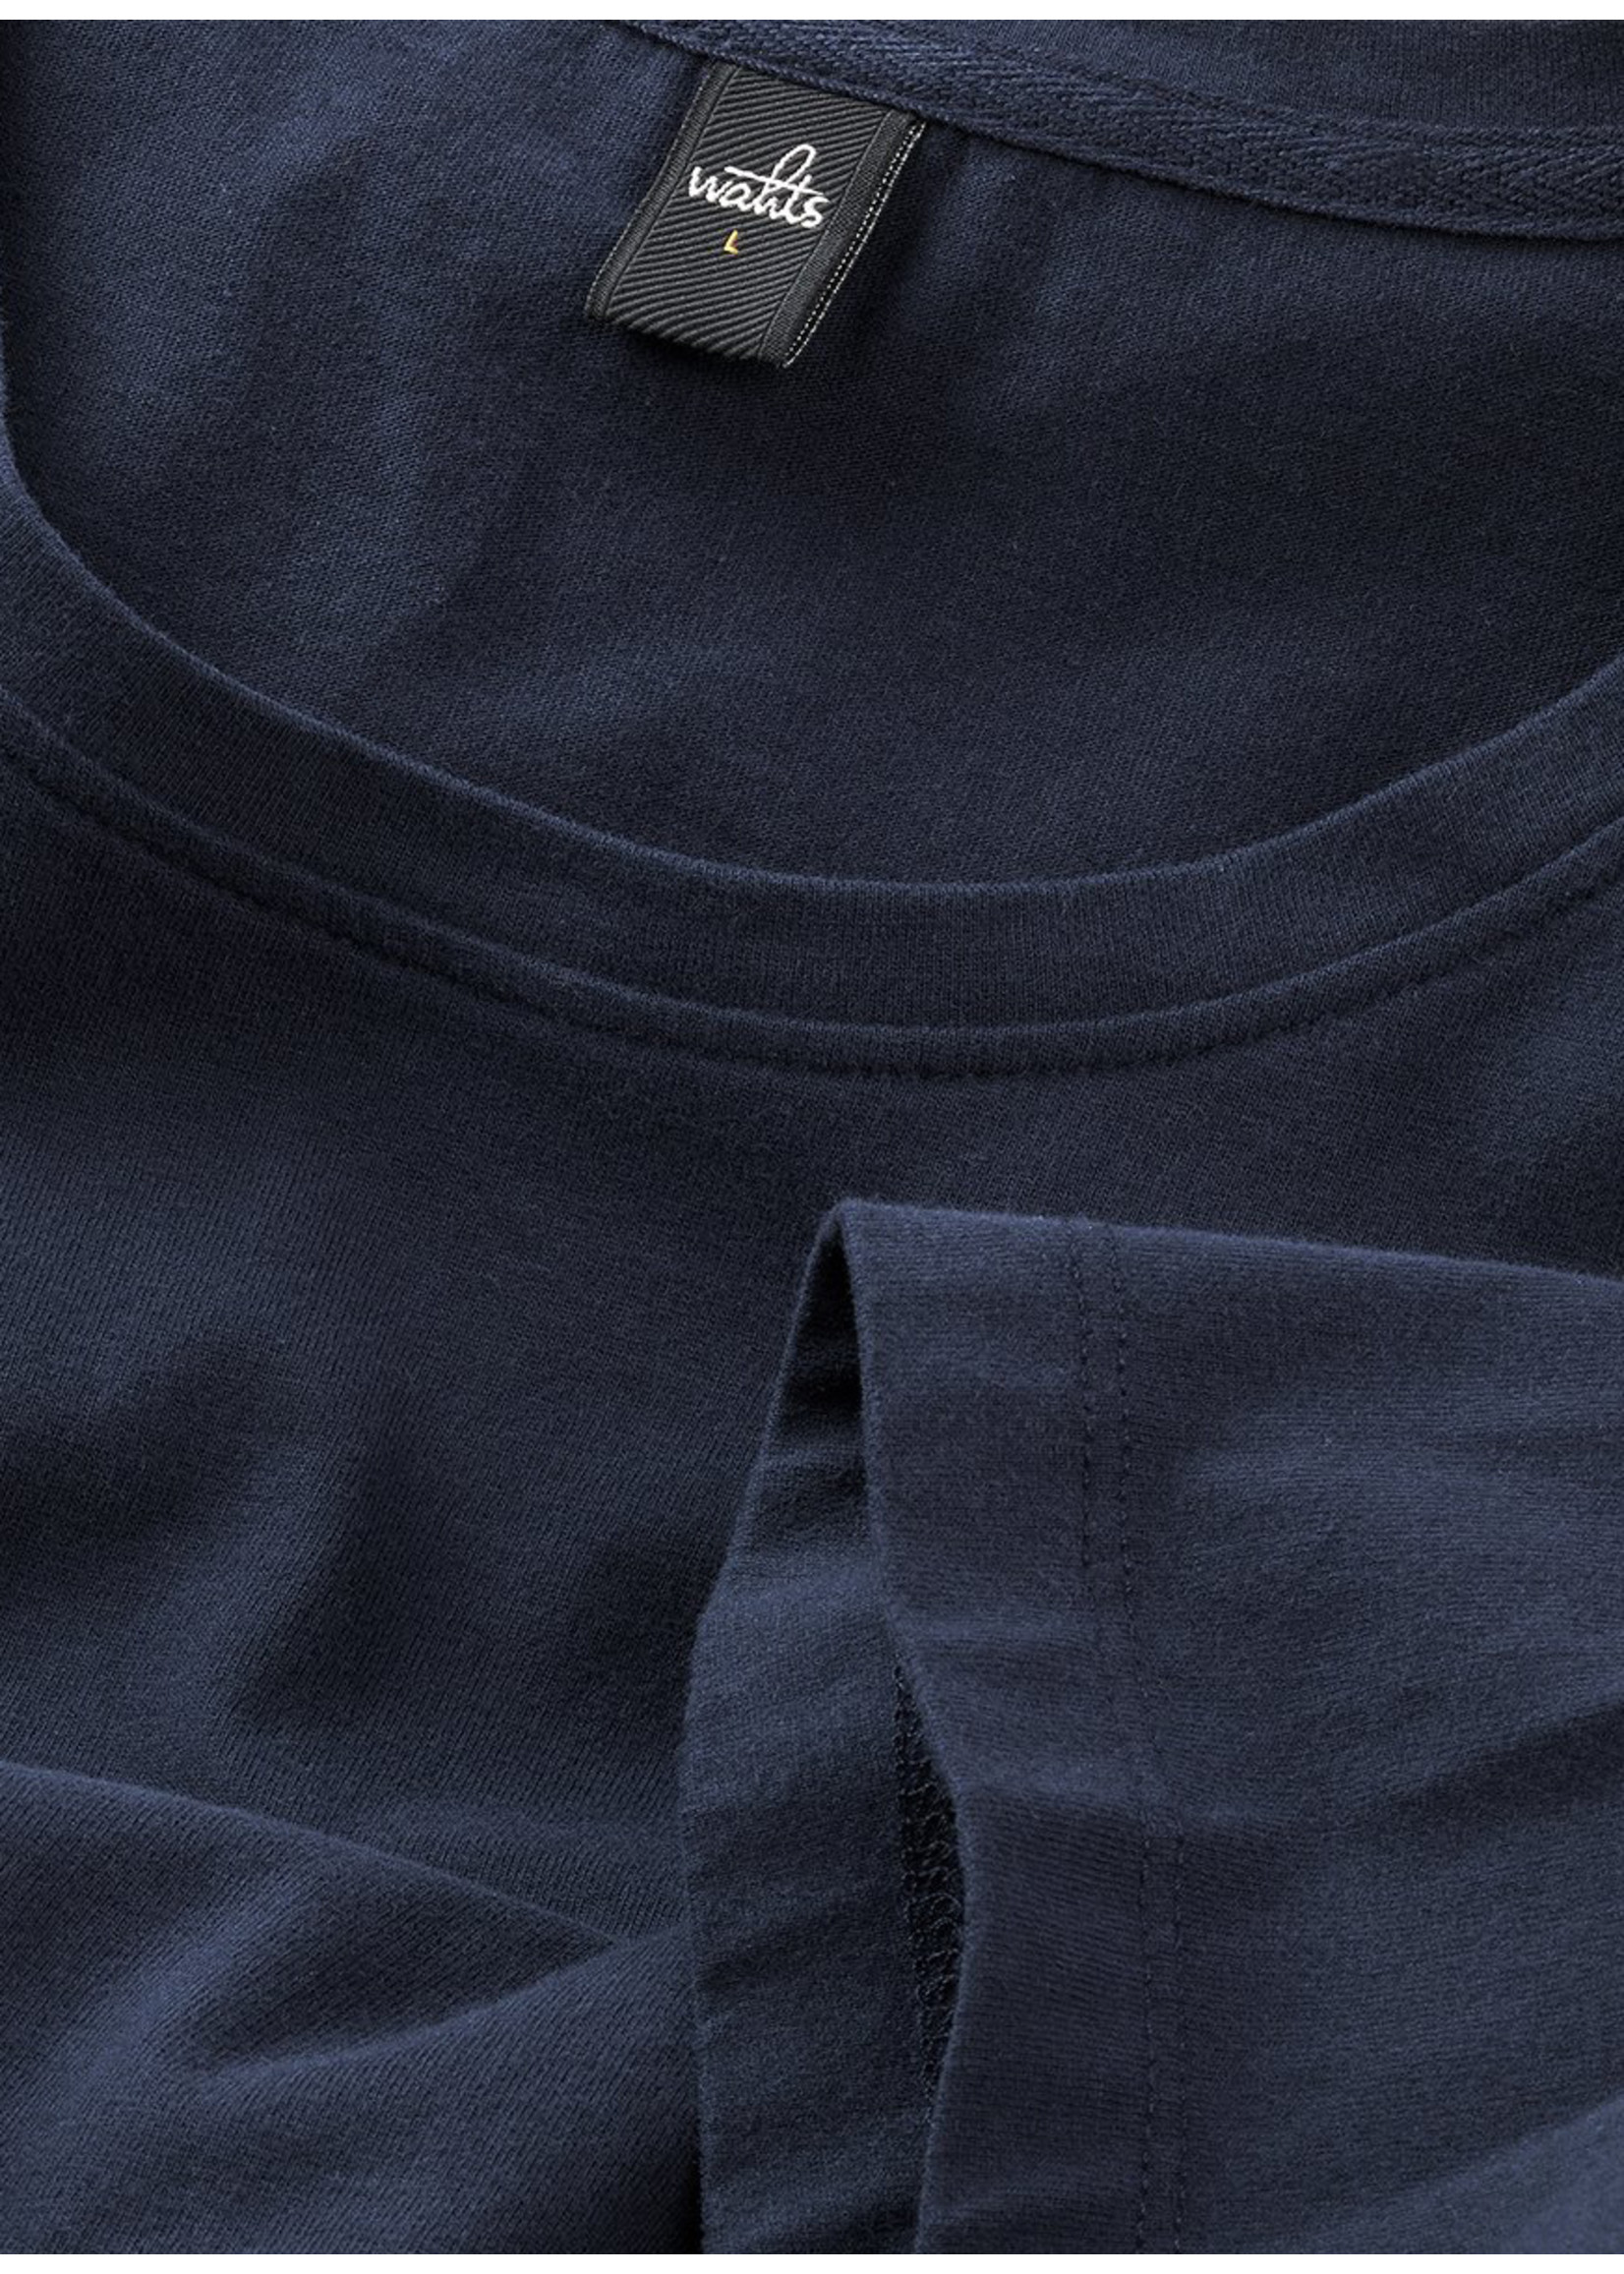 Wahts Woods crewneck tshirt dark navy